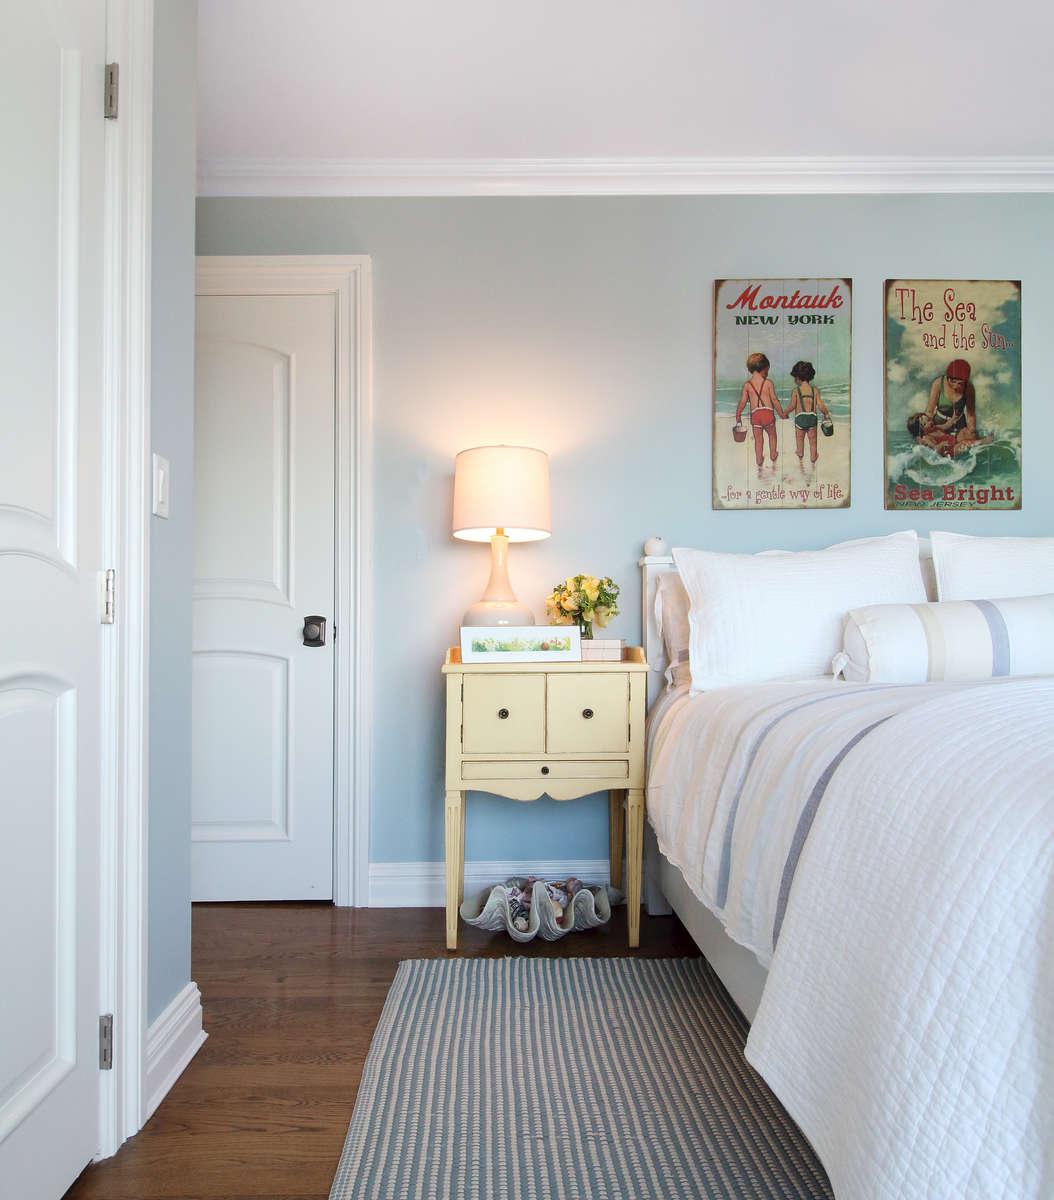 beach house bedroom with yellow nightstands